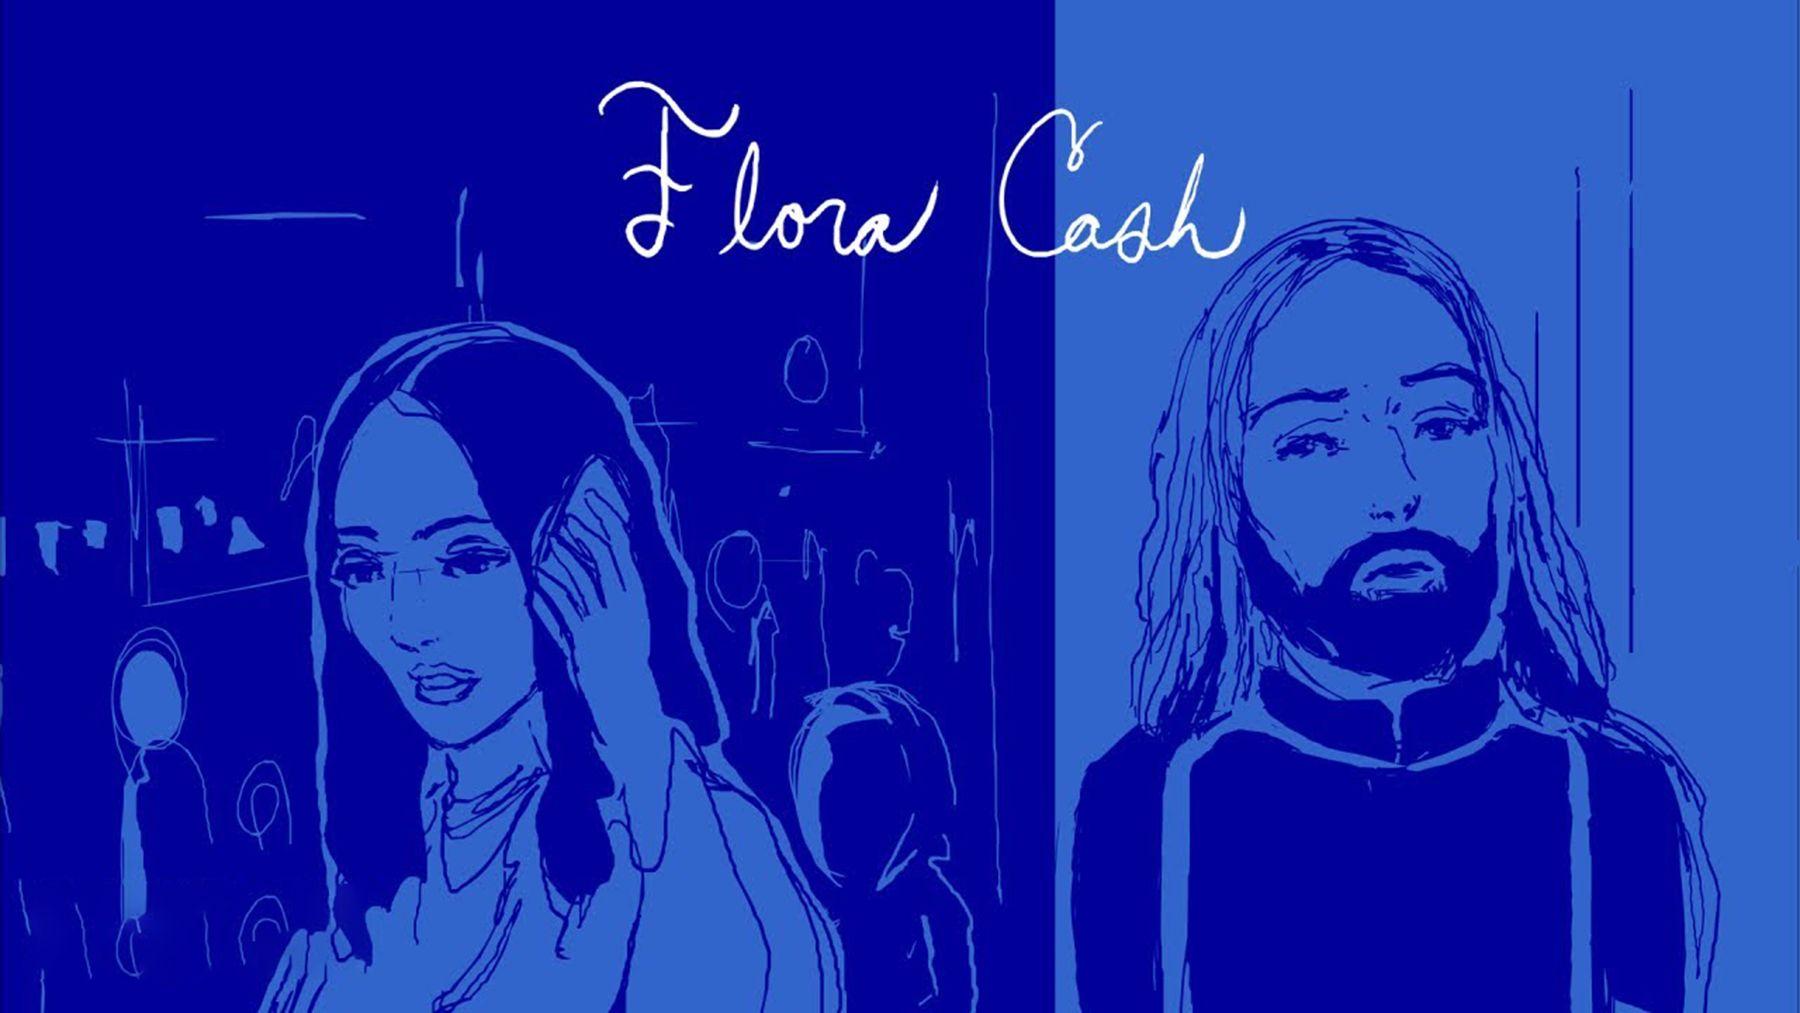 flora cash - Honey Go Home | Musik | Was is hier eigentlich los?